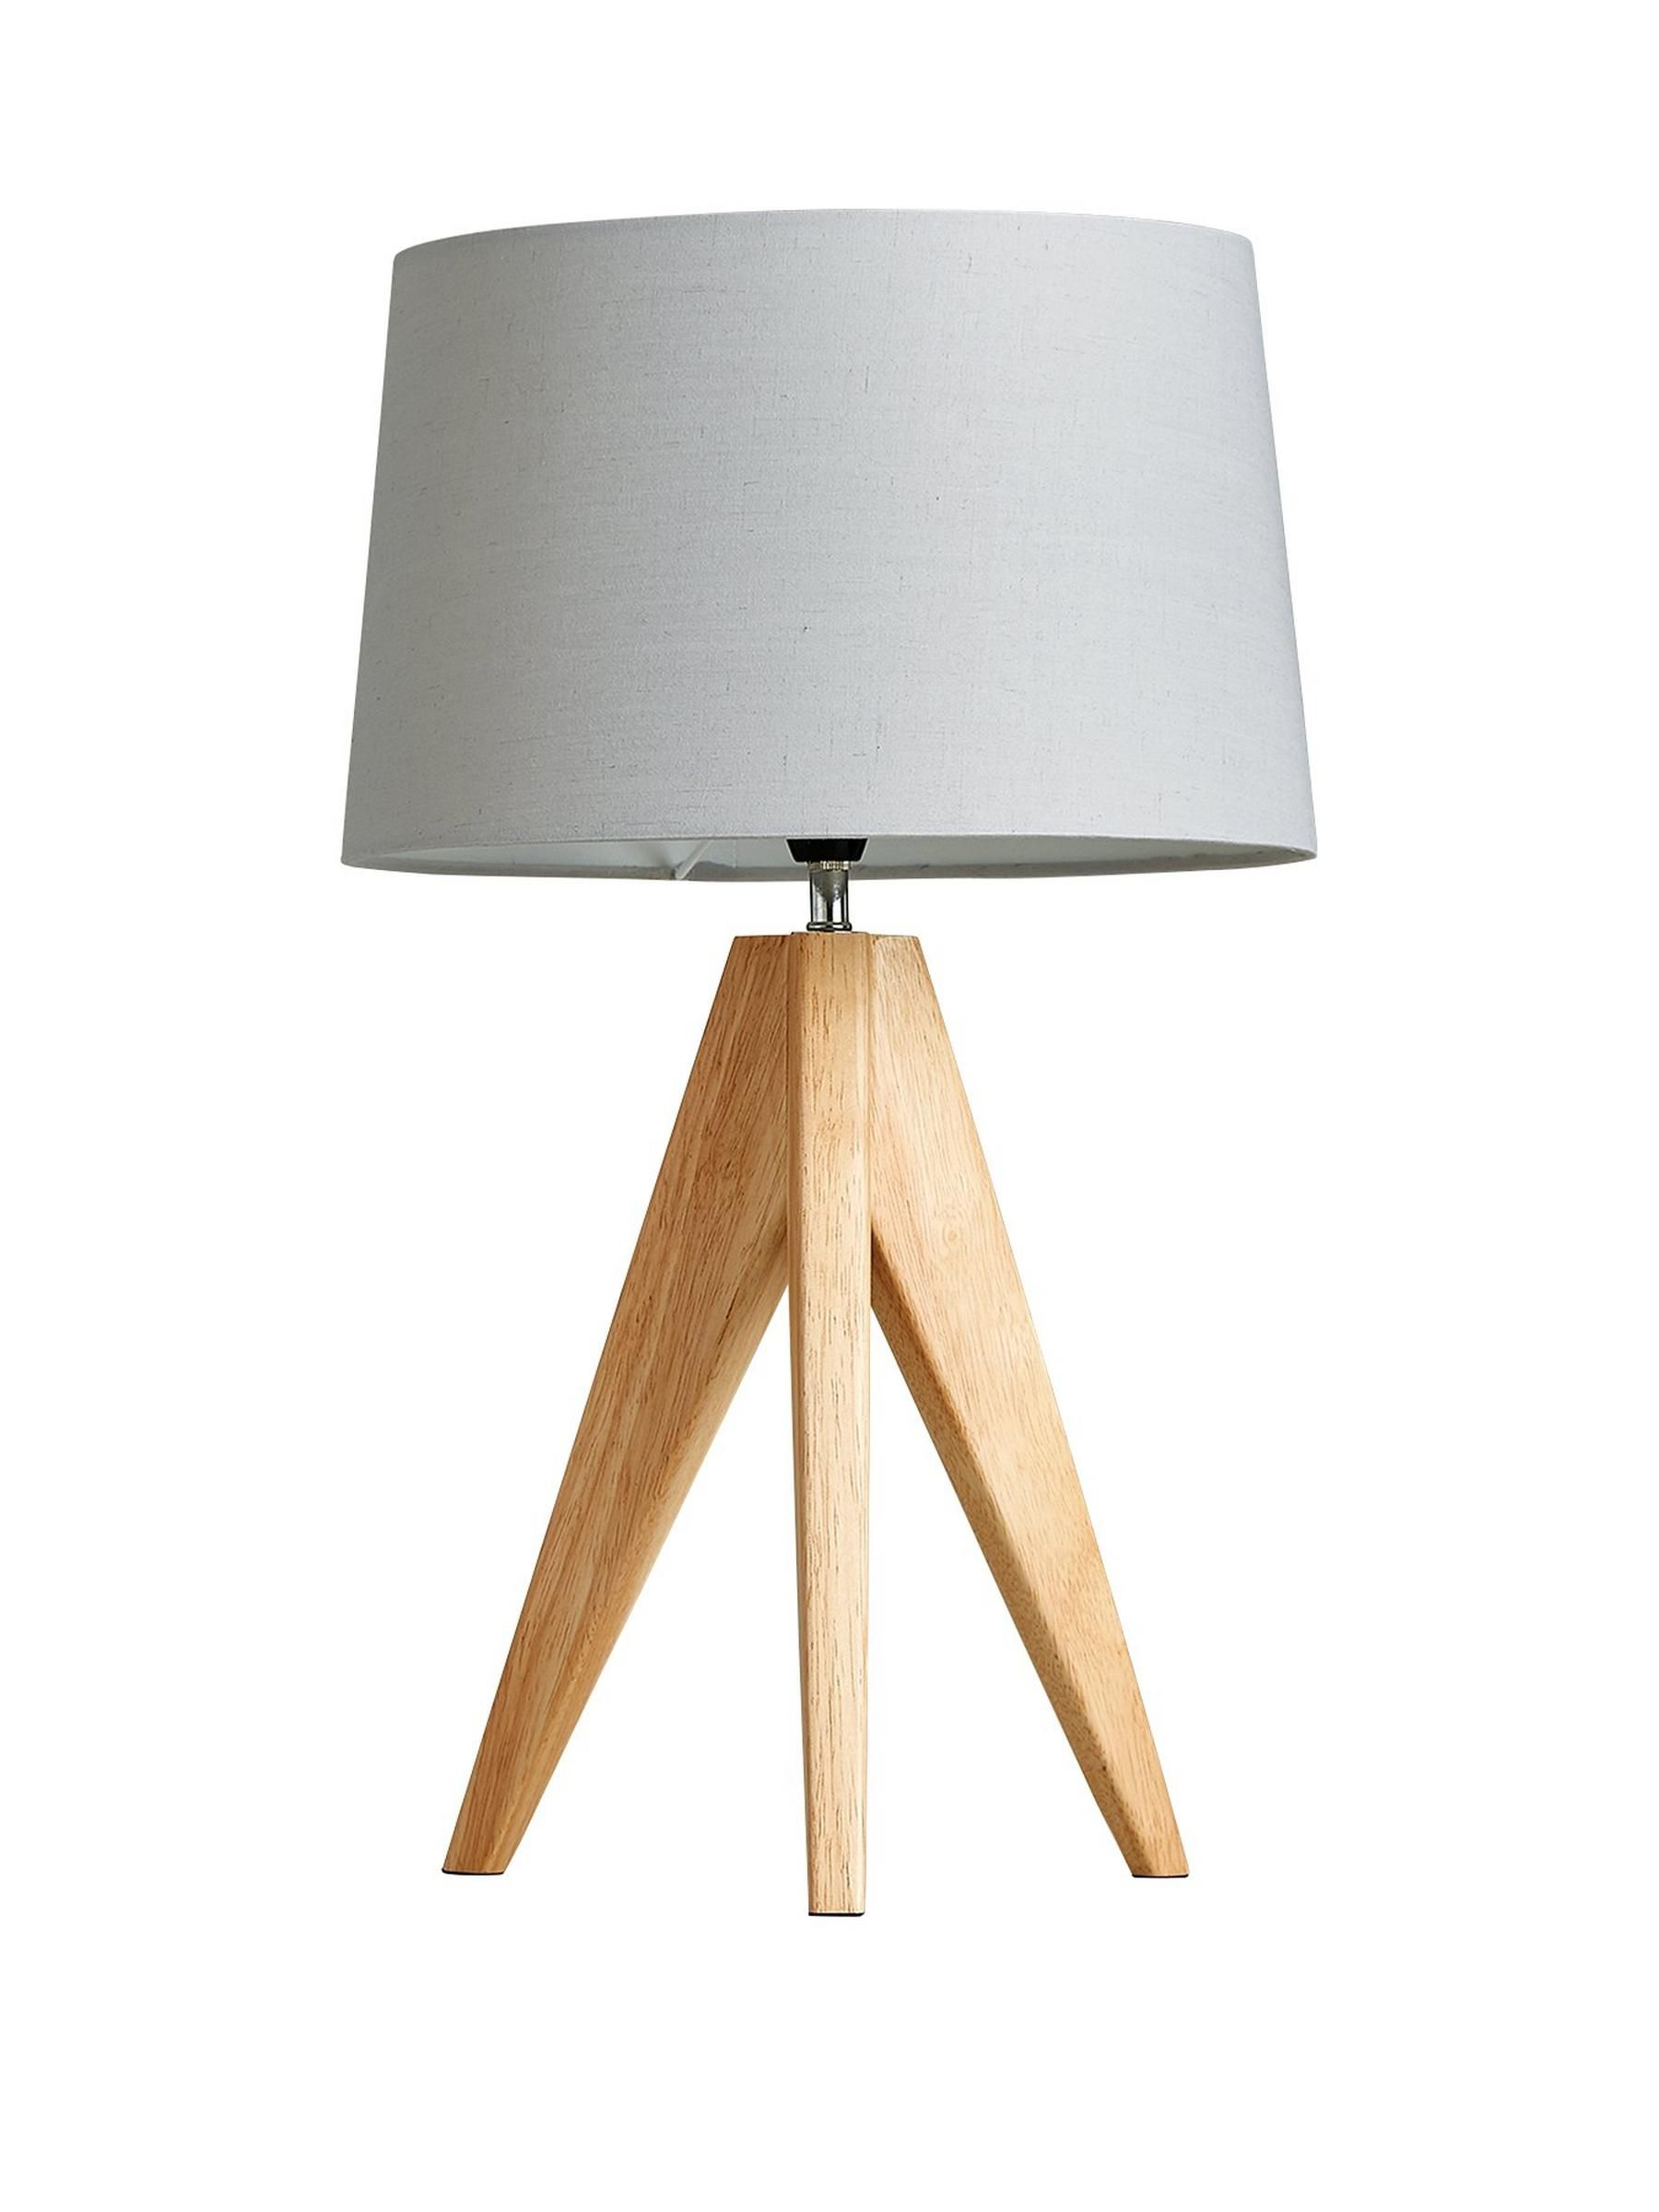 Thea Tripod Table Lamp Tripod table lamp, Wooden table